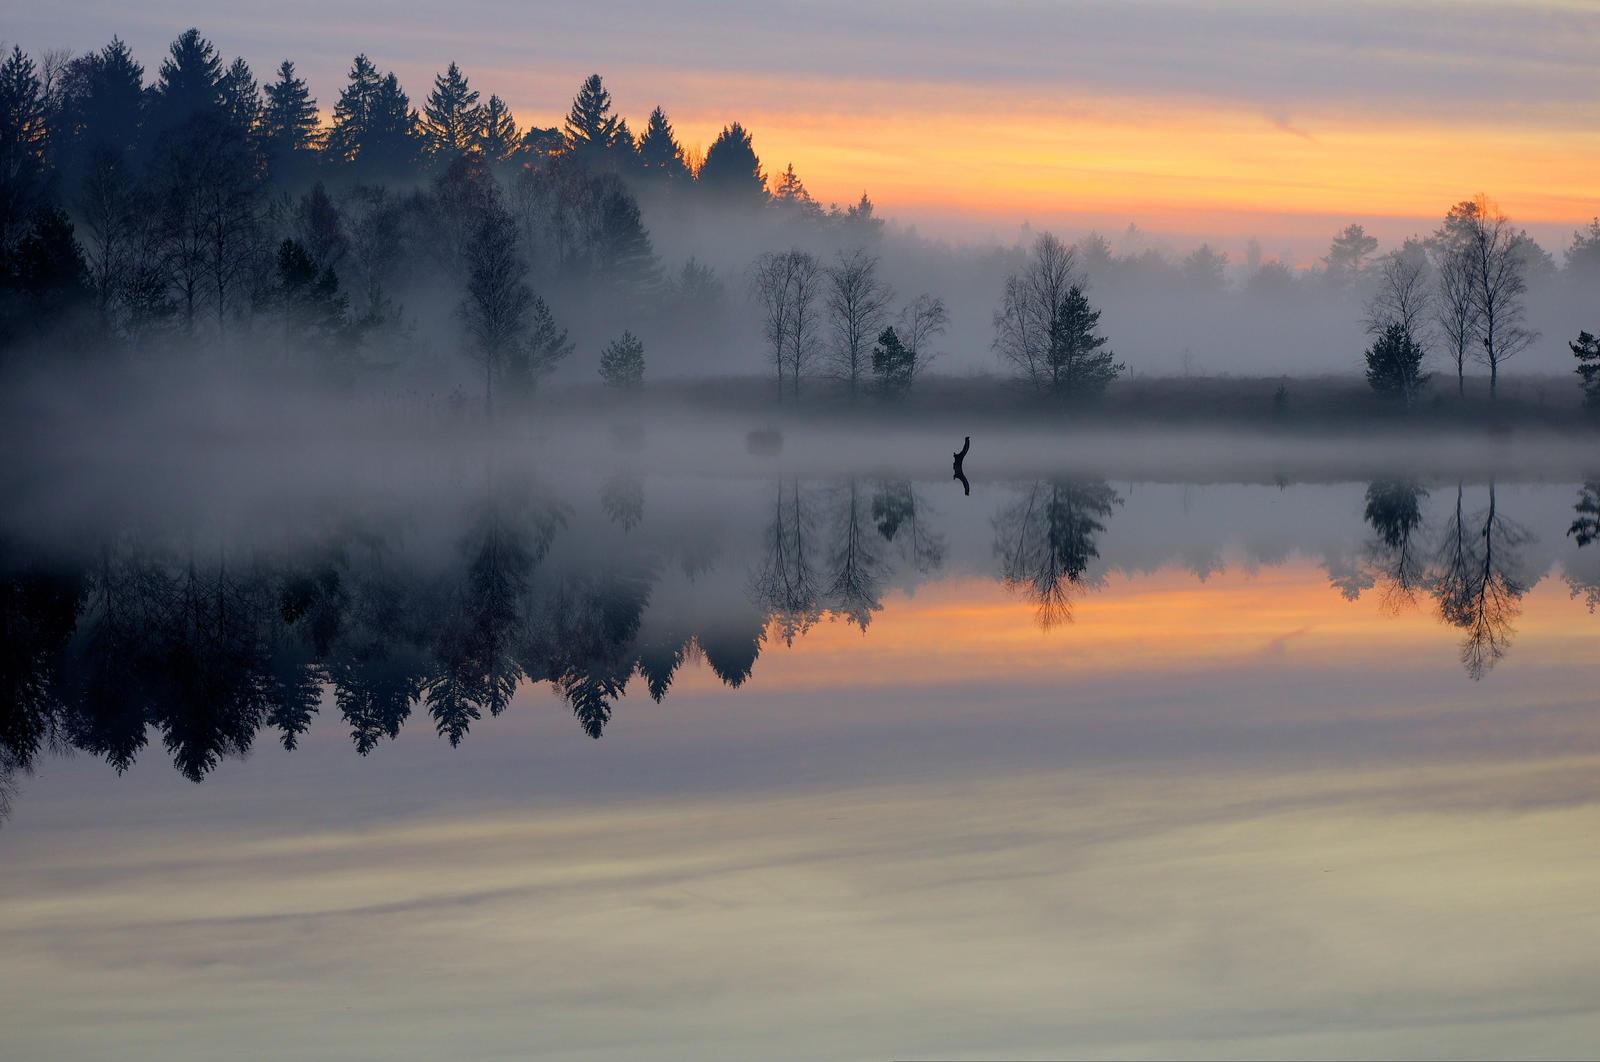 Misty Lake by Burtn